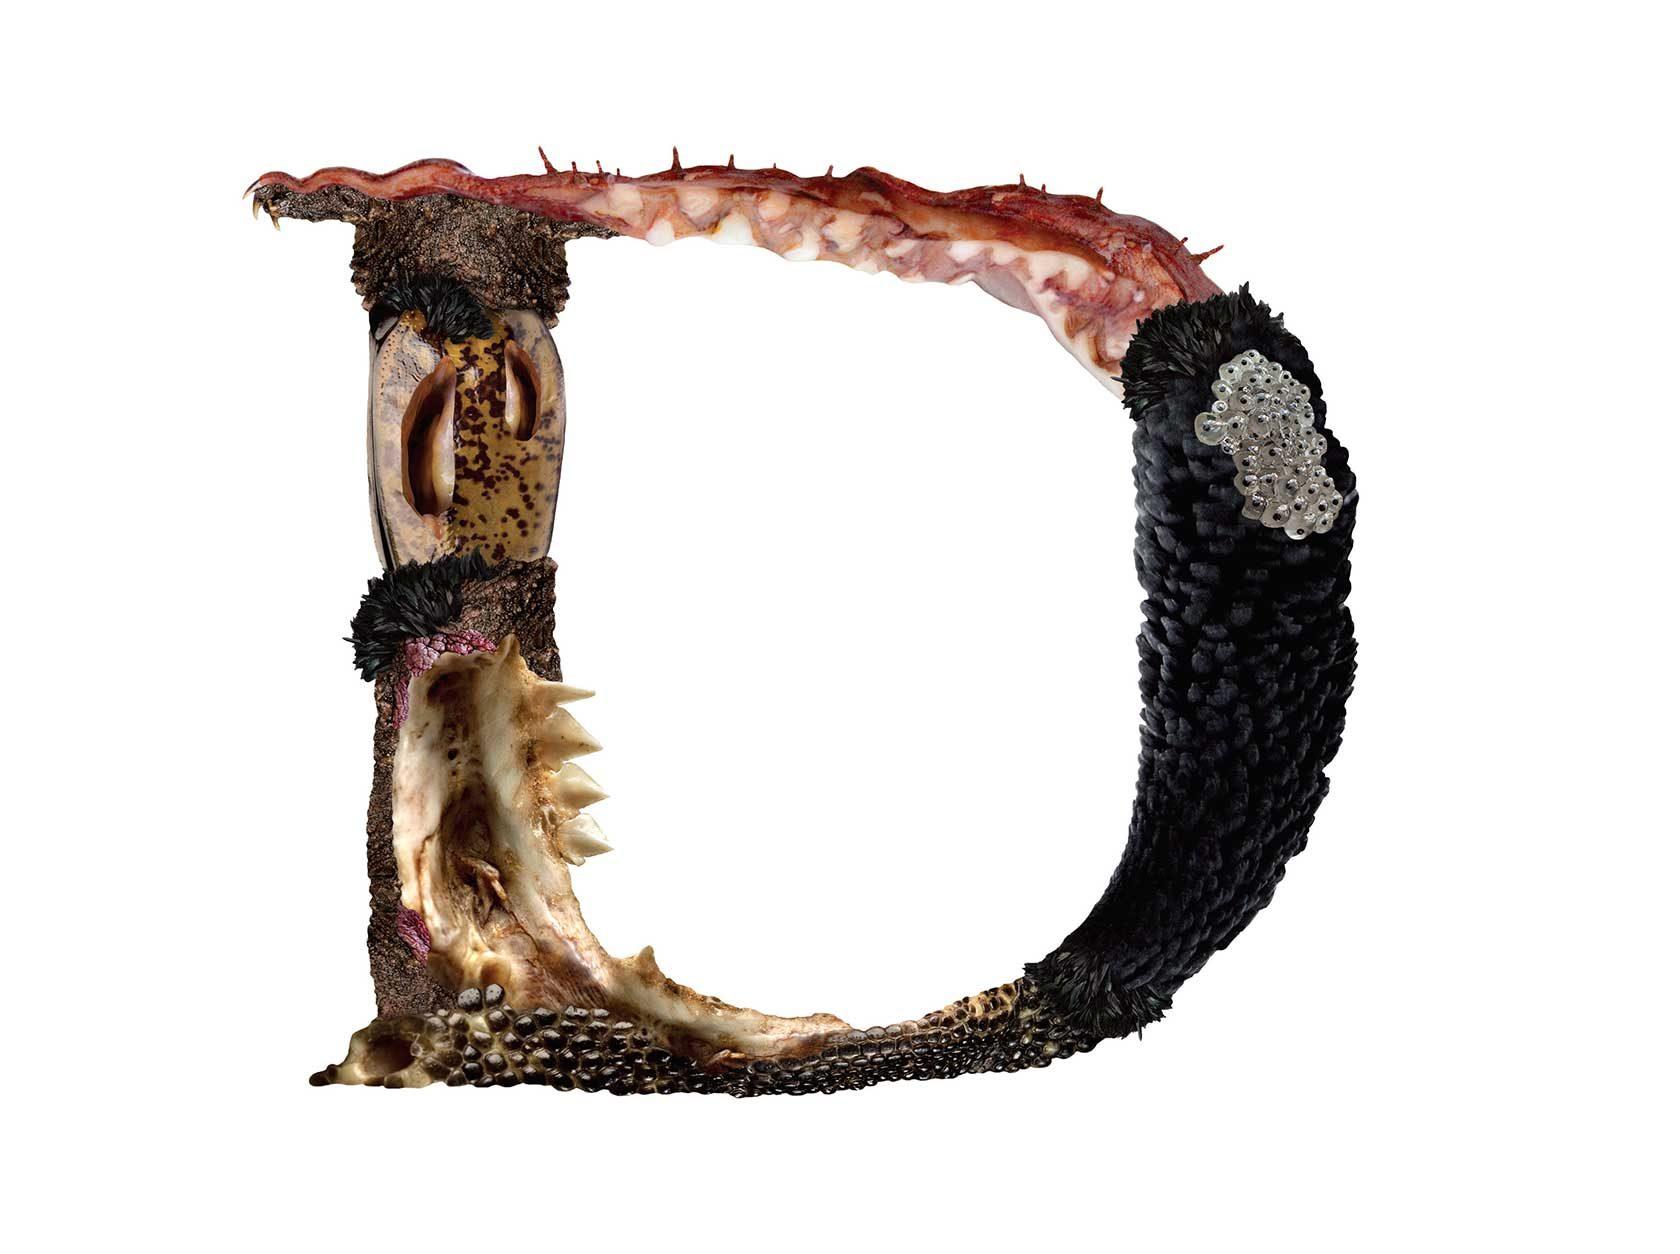 Bird Headed Monster Letter D2 Design by Furia